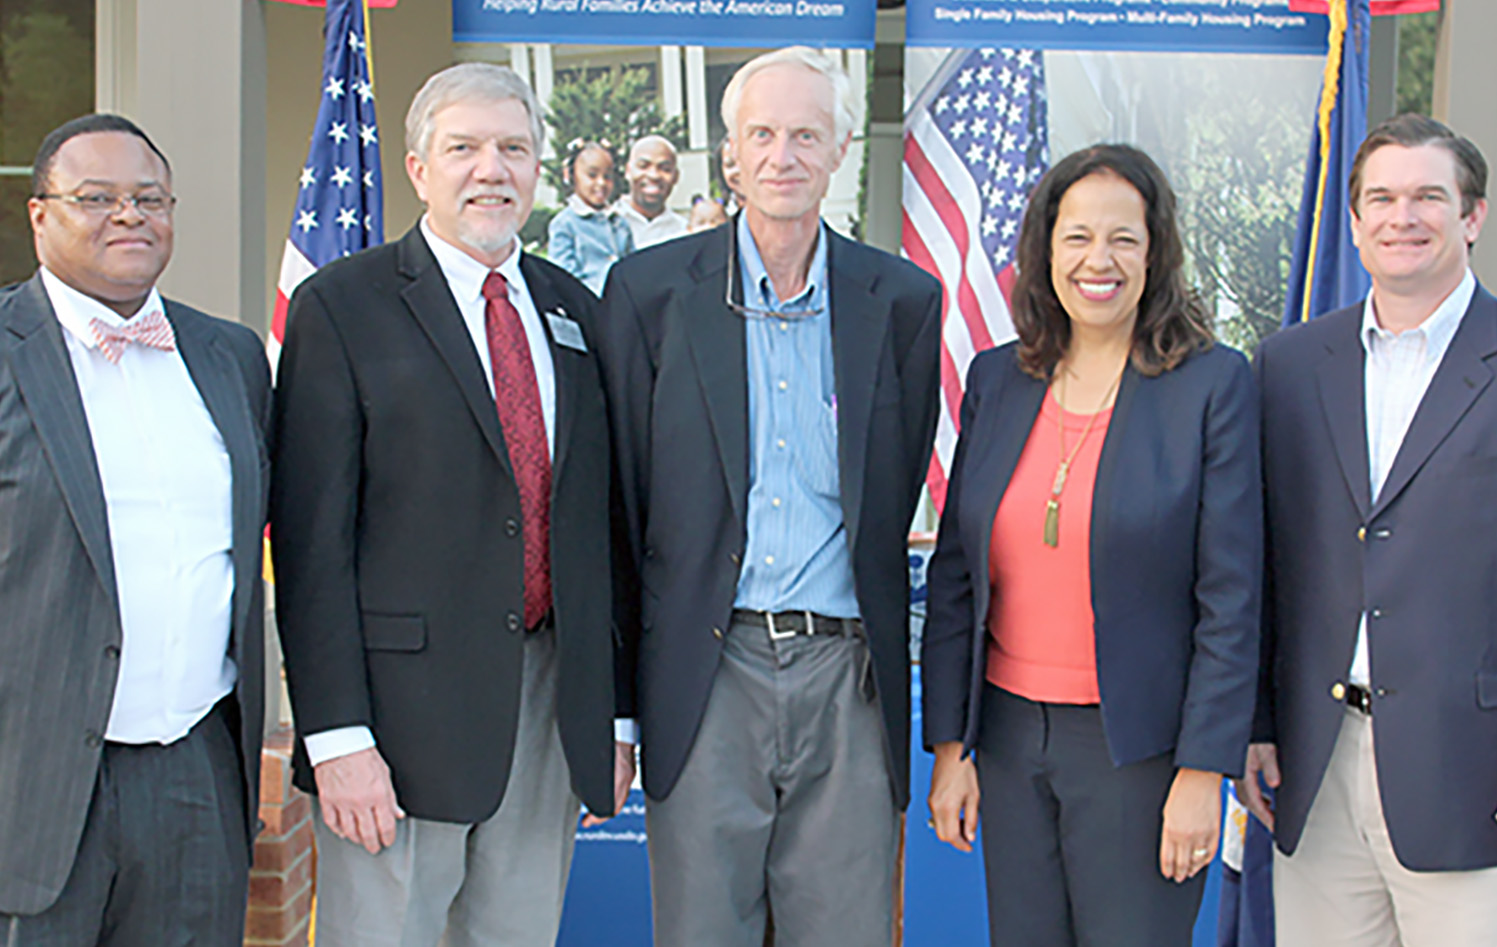 Pictured, from left, are Quentin Robinson, Georgia Director for USDA Rural Development; Joe West, assistant dean of UGA Tifton Campus; Craig Kvien; Lisa Mensah, USDA Rural Development Undersecretary; and Representative Austin Scott.